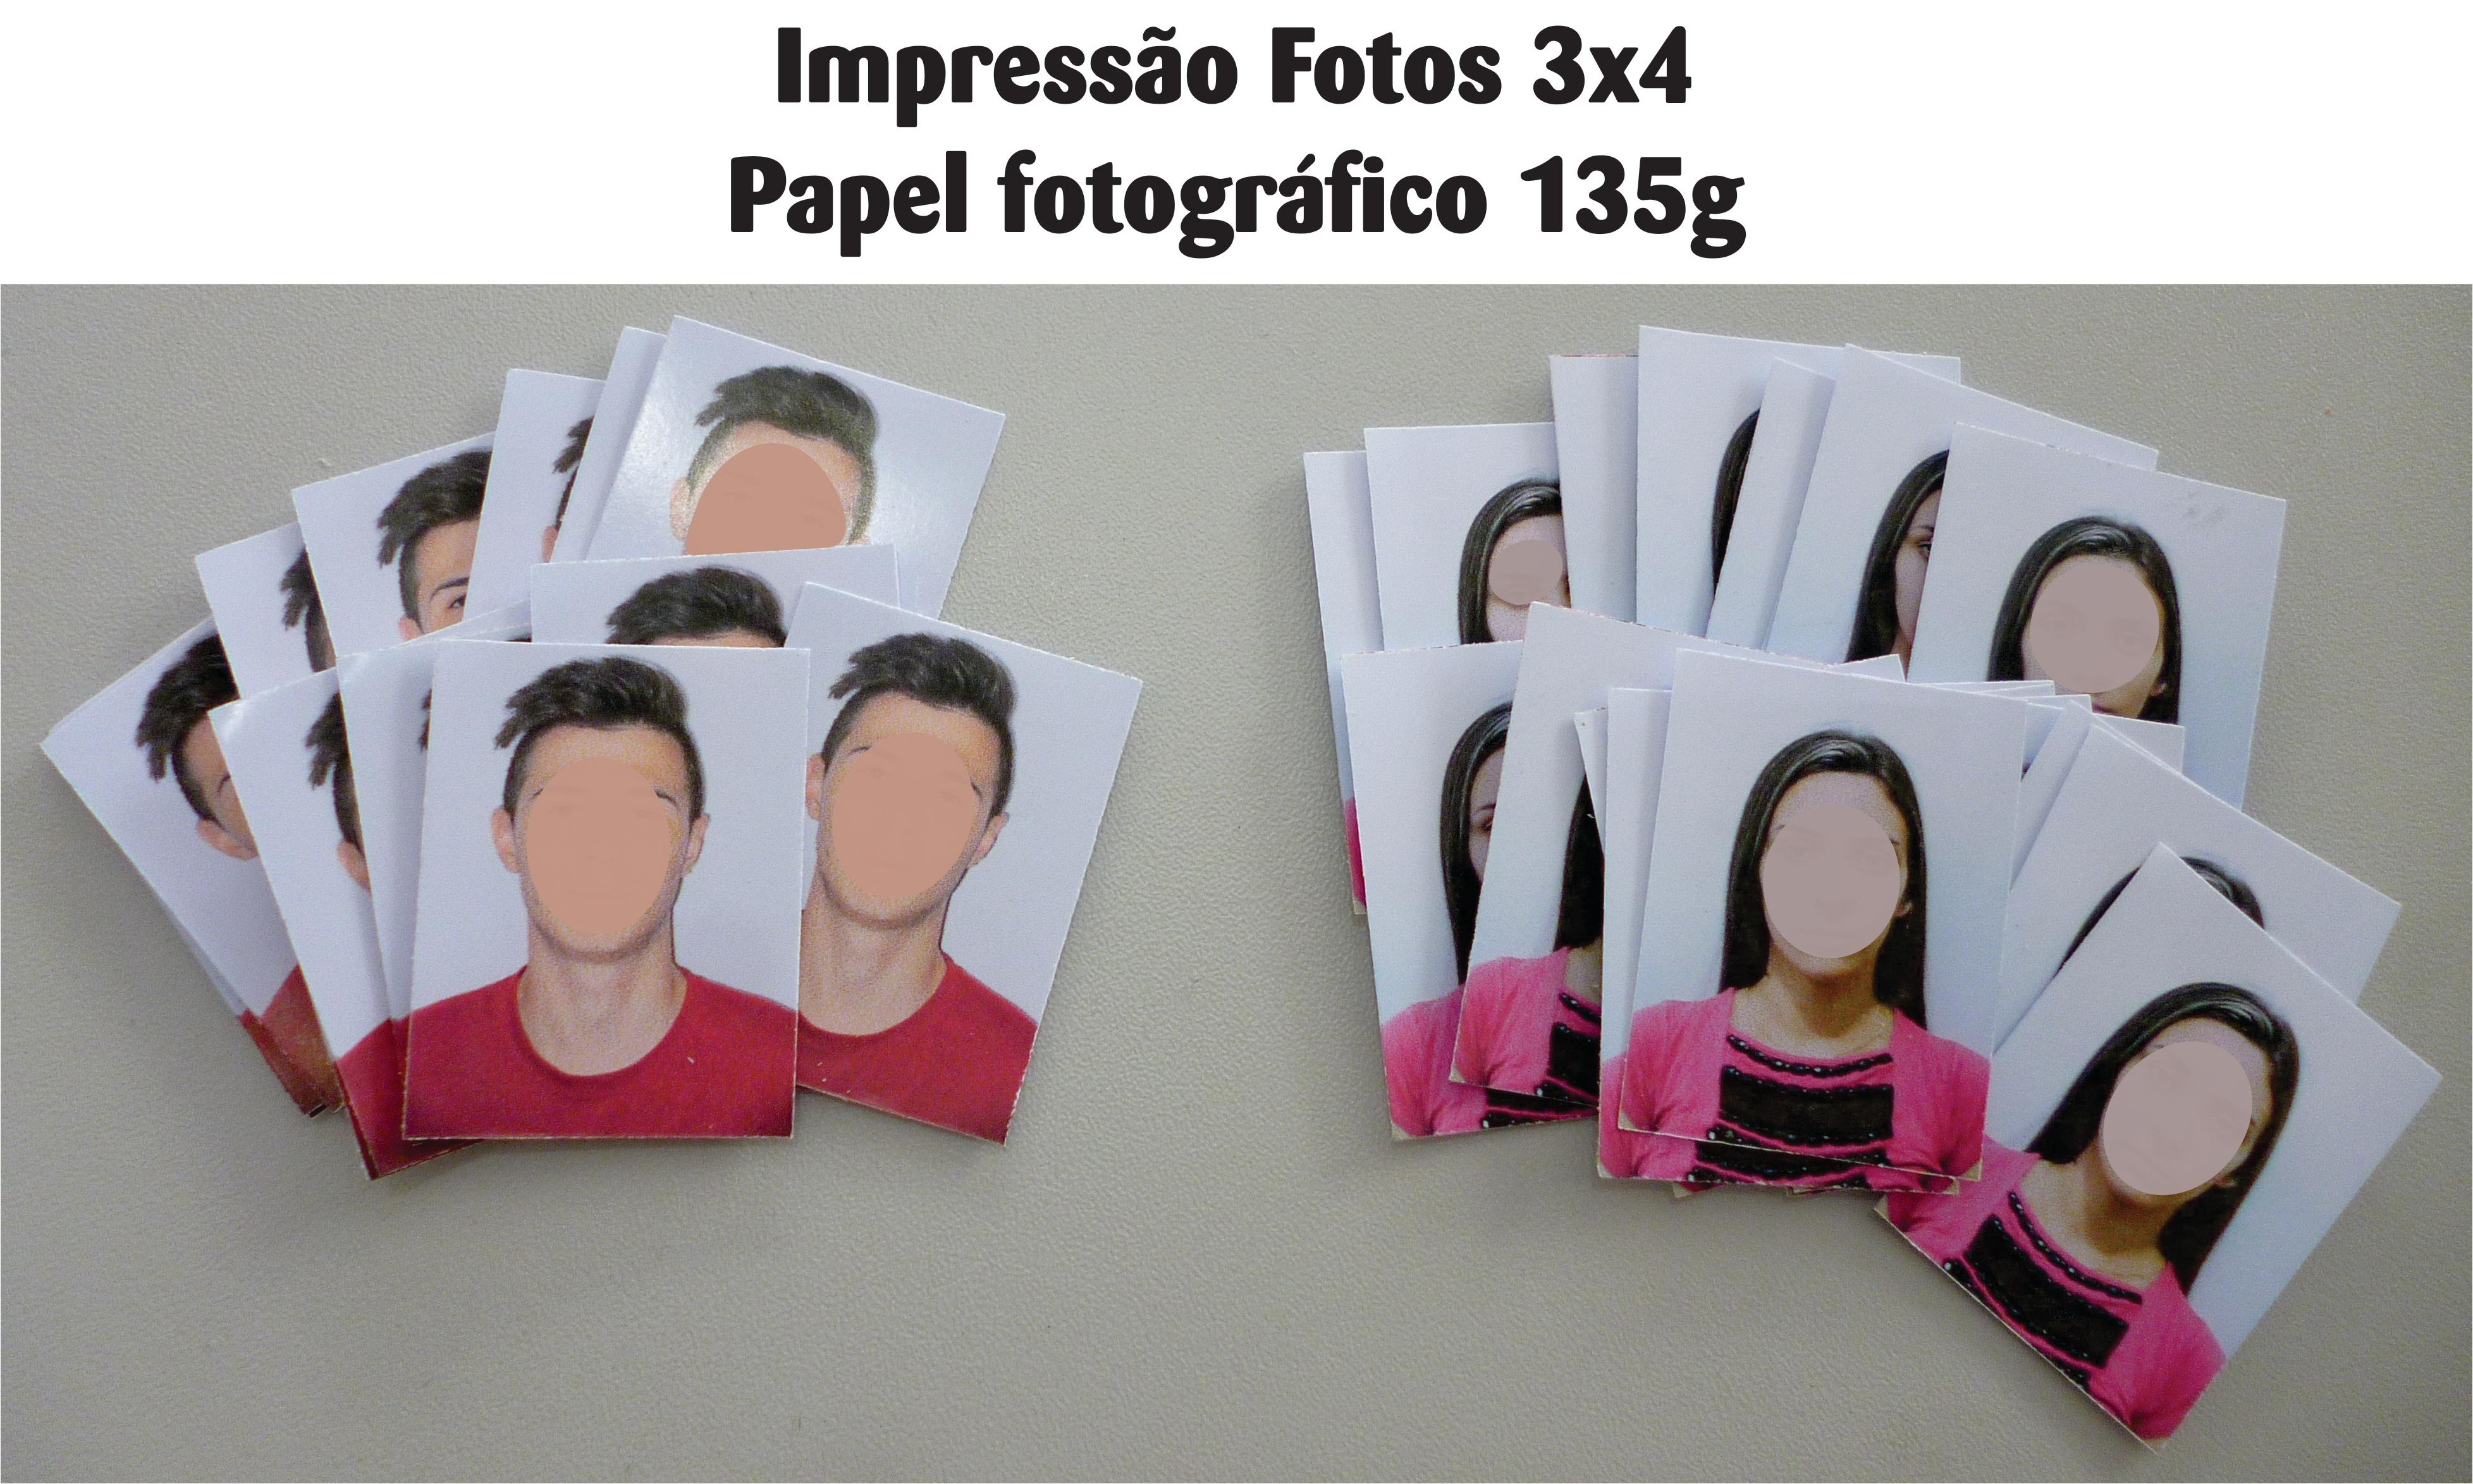 FOTOS 3x4 PAPEL FOTOGRÁFICO 135g